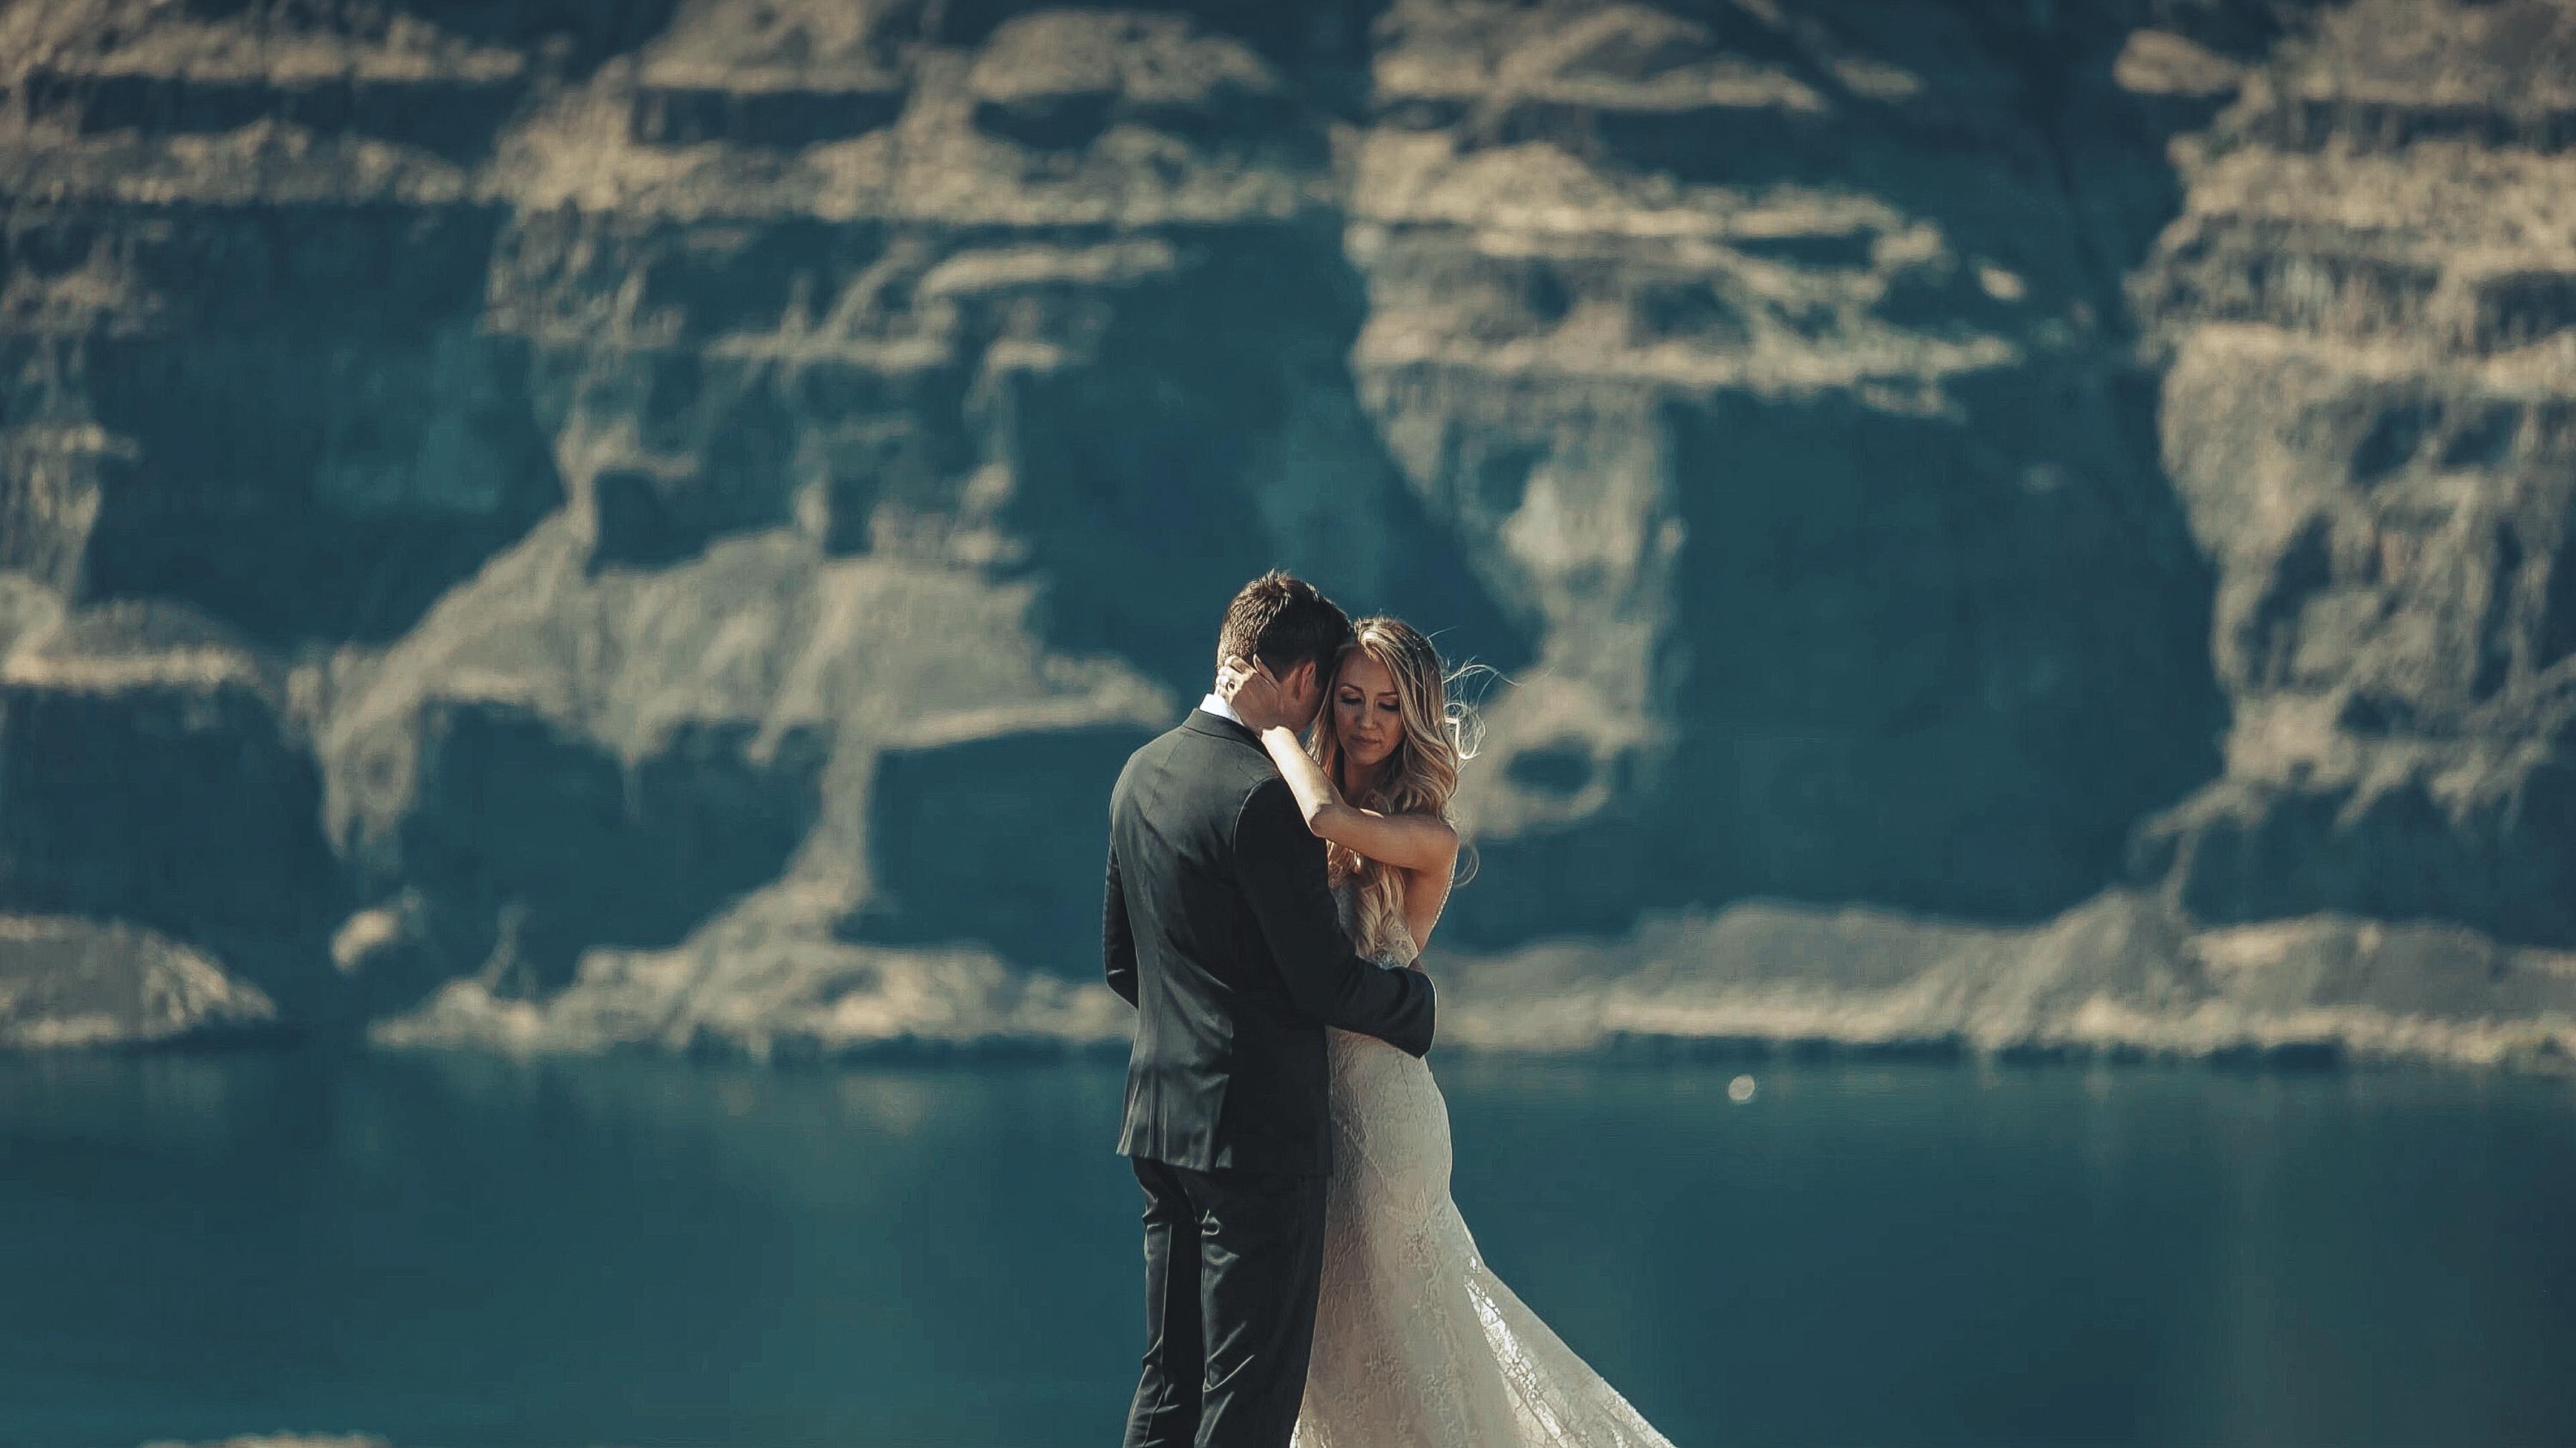 https://sleeklens.com/wp-content/uploads/2018/09/wedding-lightroom-presets-signature-bride-groom-after-12.jpg